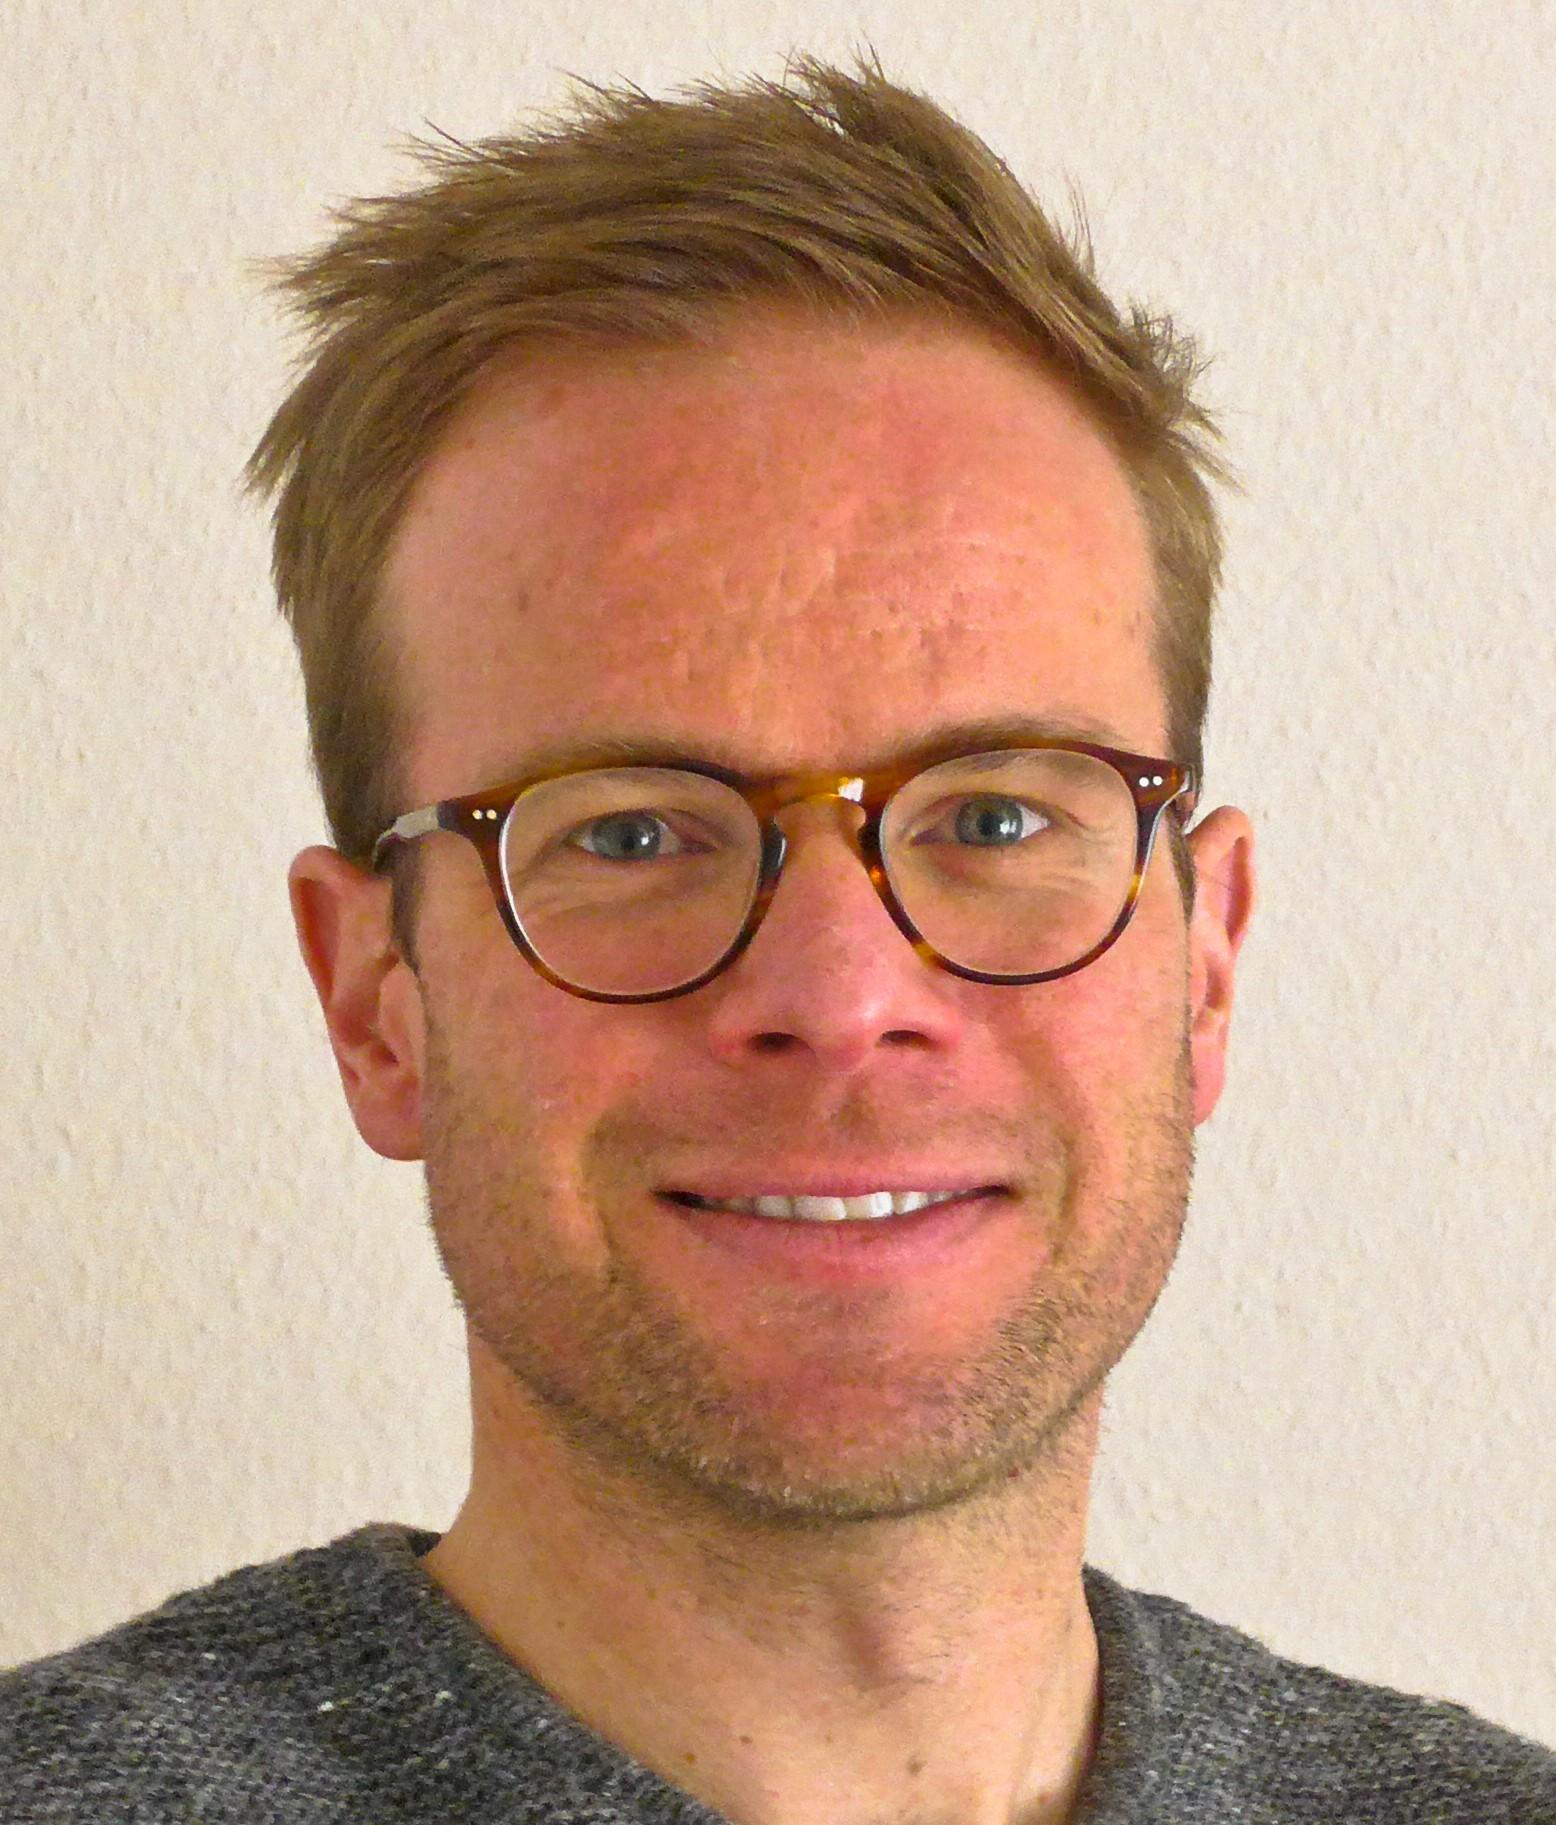 Lars Millentrup